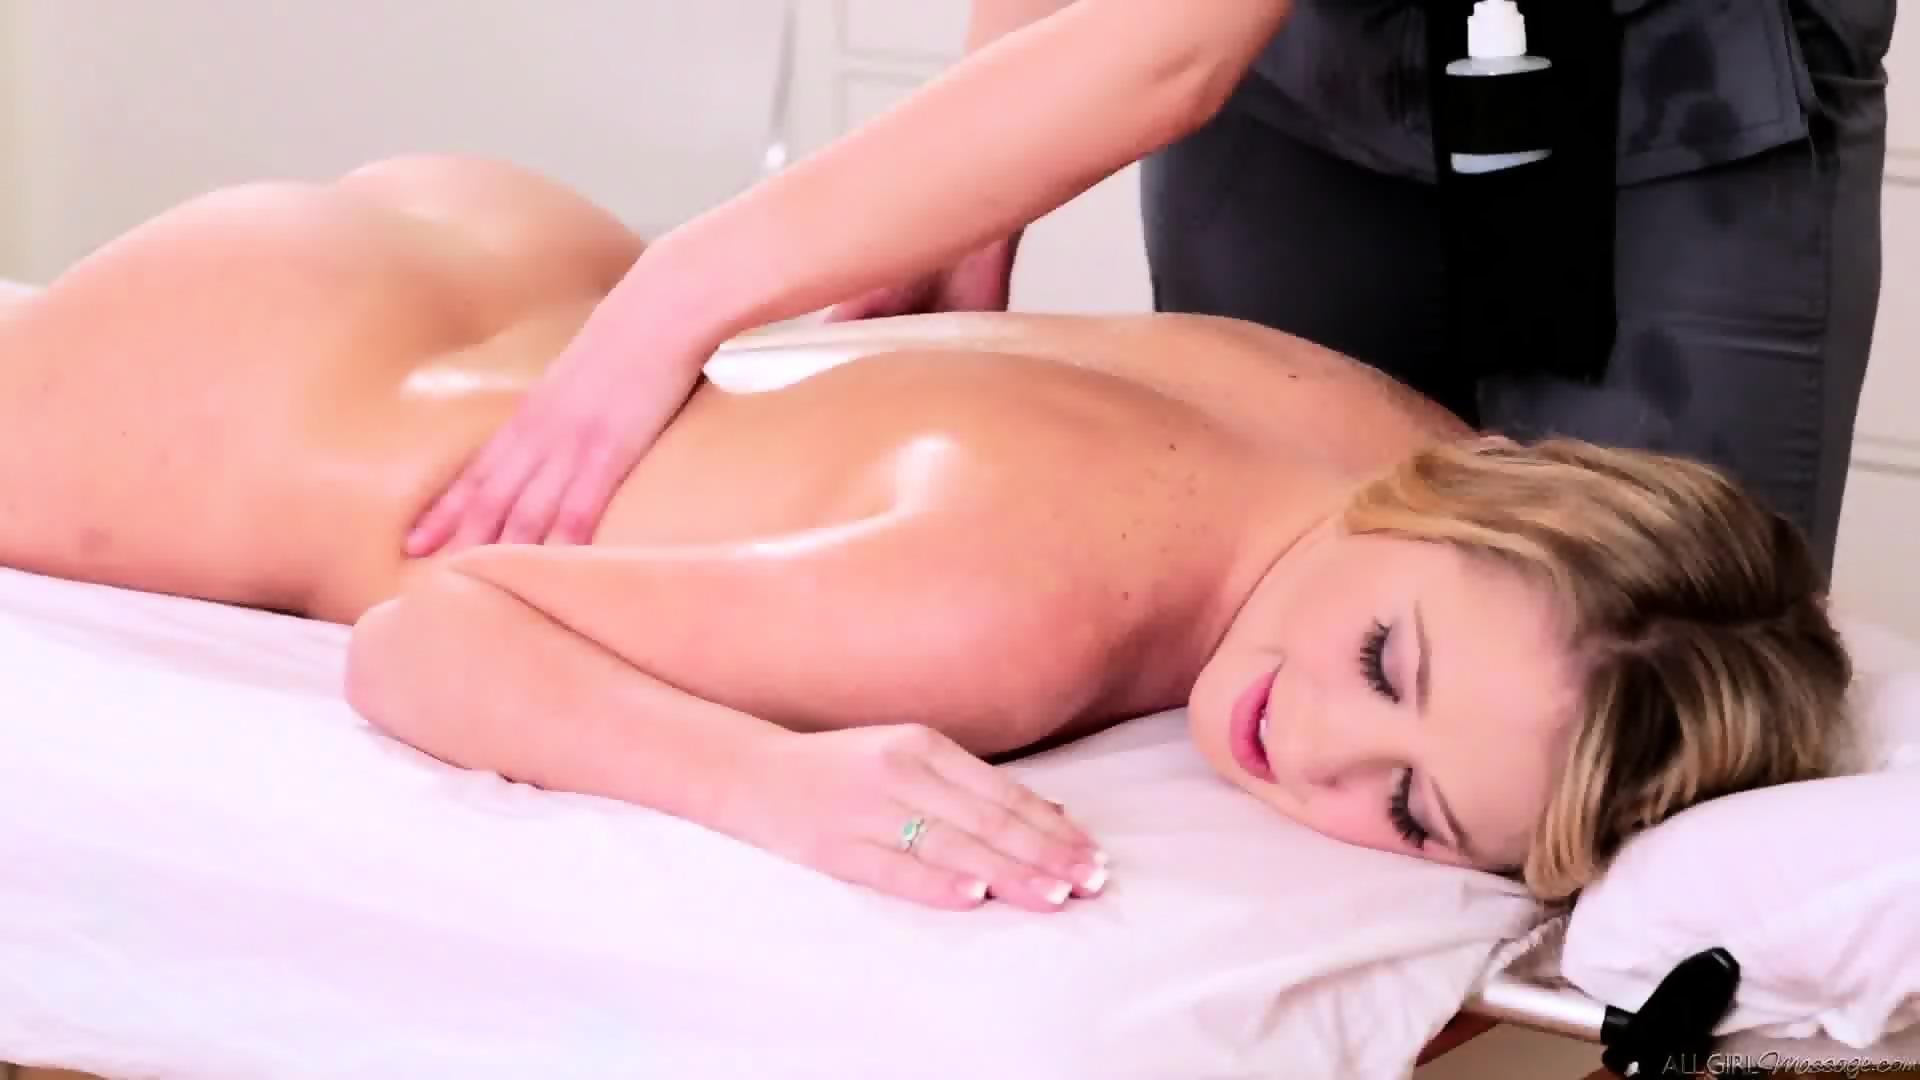 Full body massage video